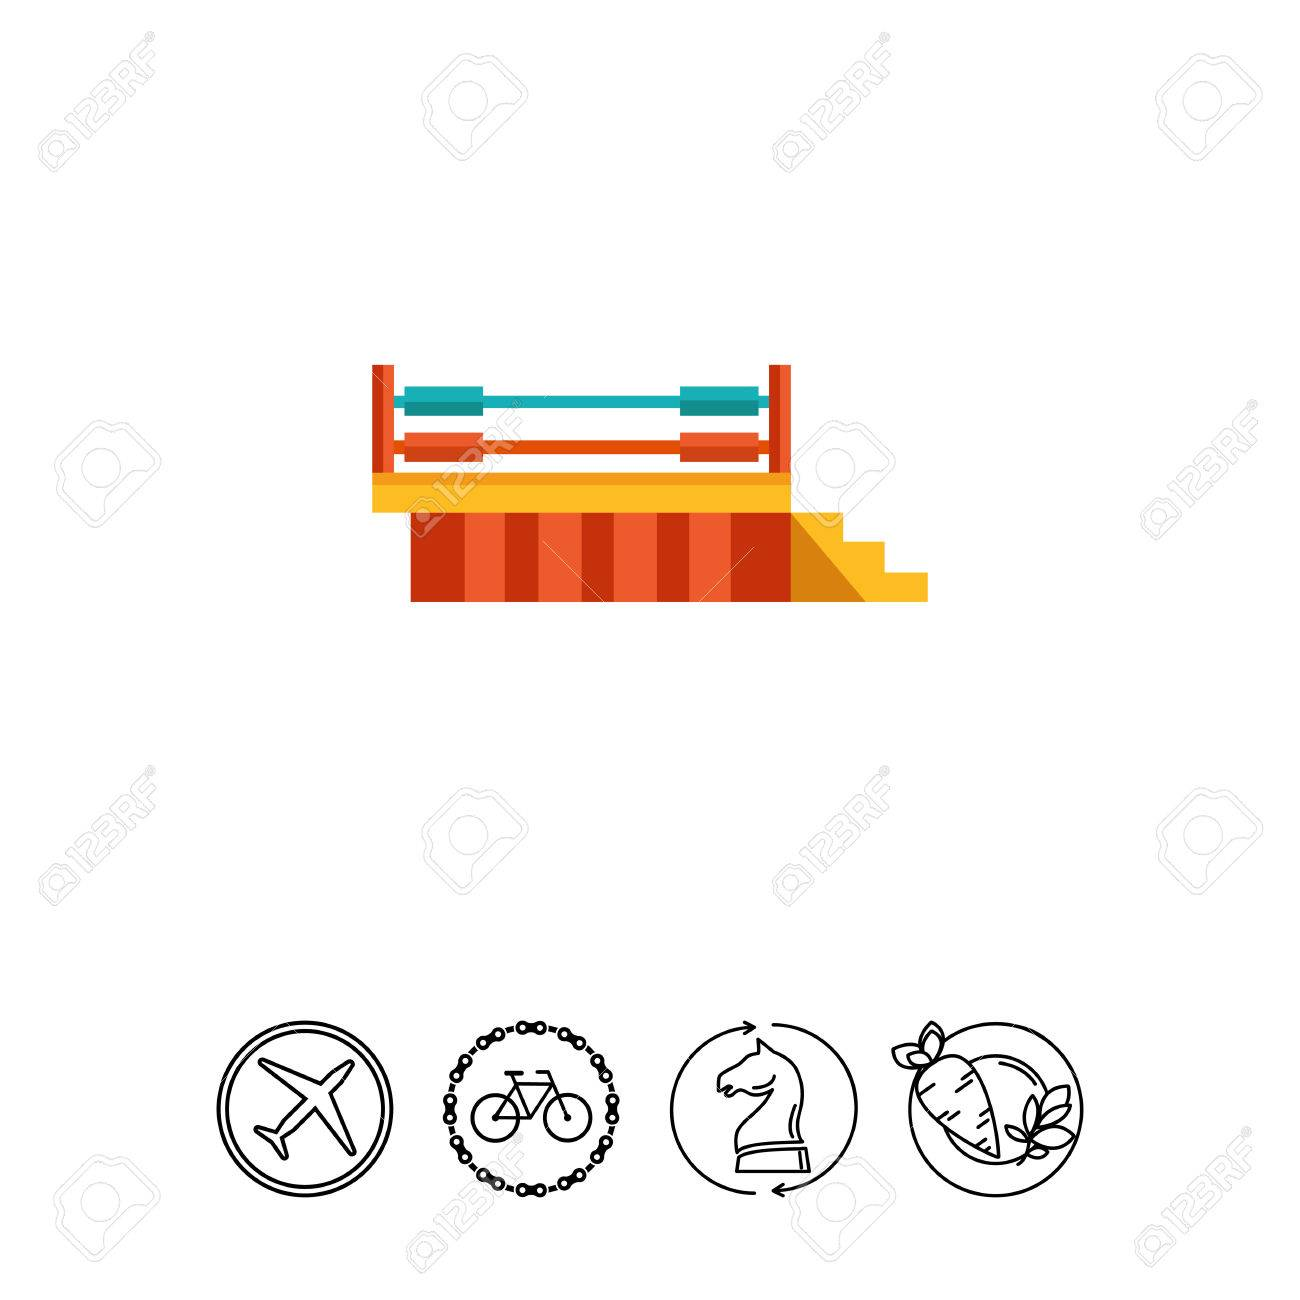 Boxing ring icon royalty free cliparts vectors and stock boxing ring icon stock vector 77706840 ccuart Images